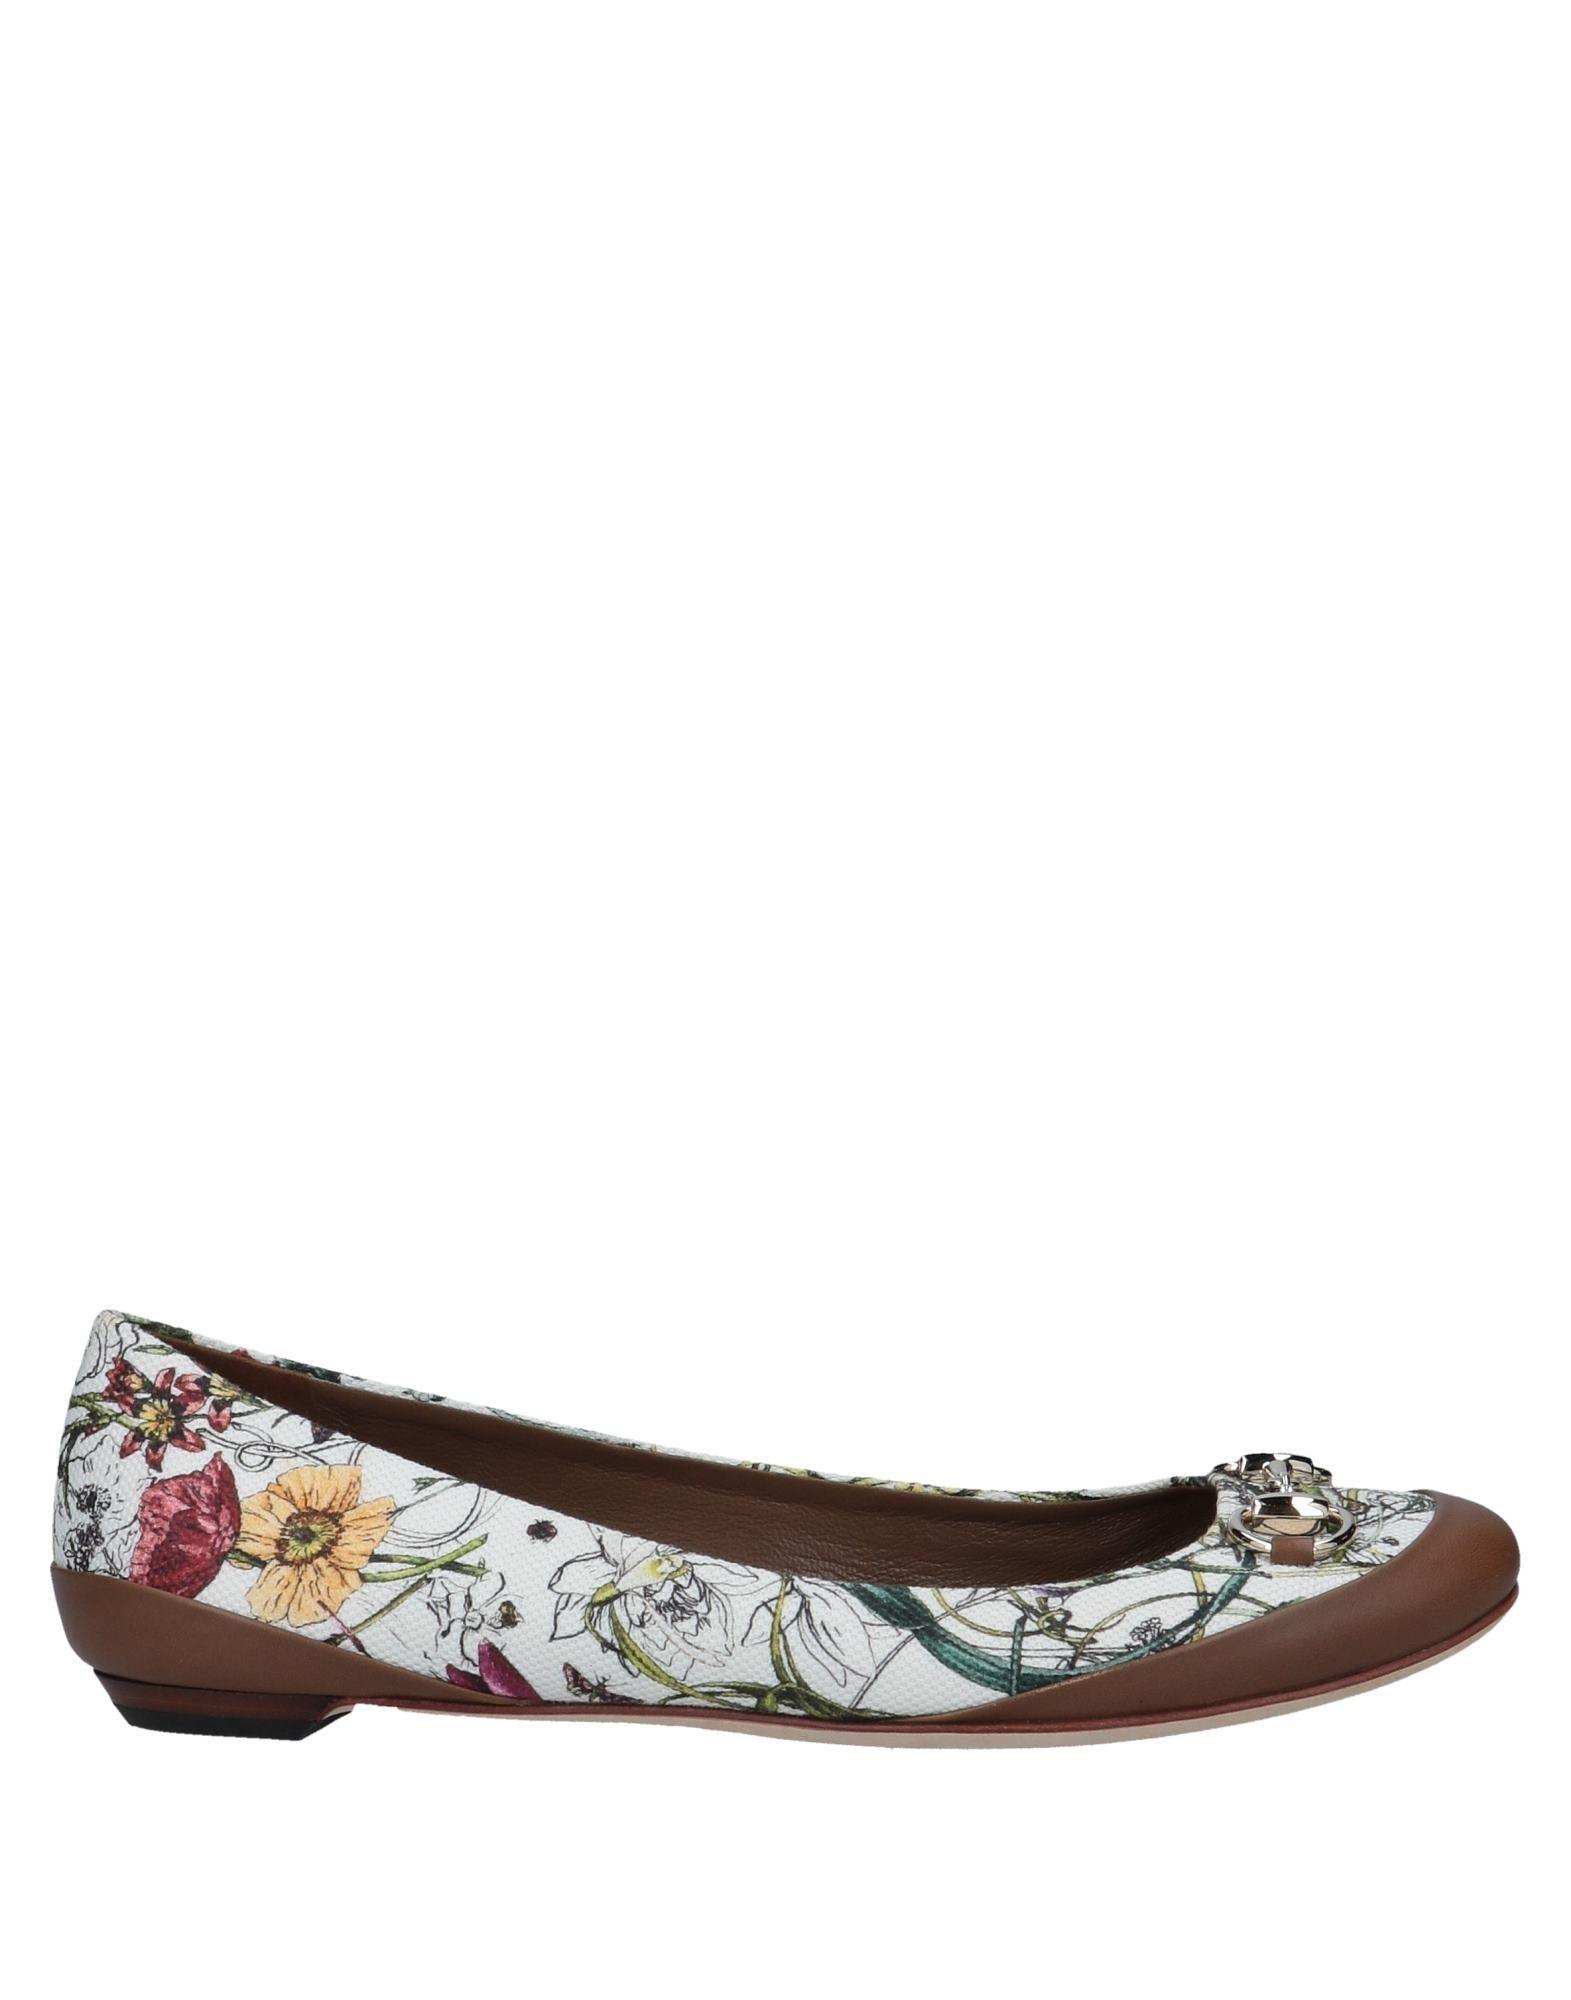 Rabatt Schuhe 11550291KS Gucci Ballerinas Damen  11550291KS Schuhe 2c7438